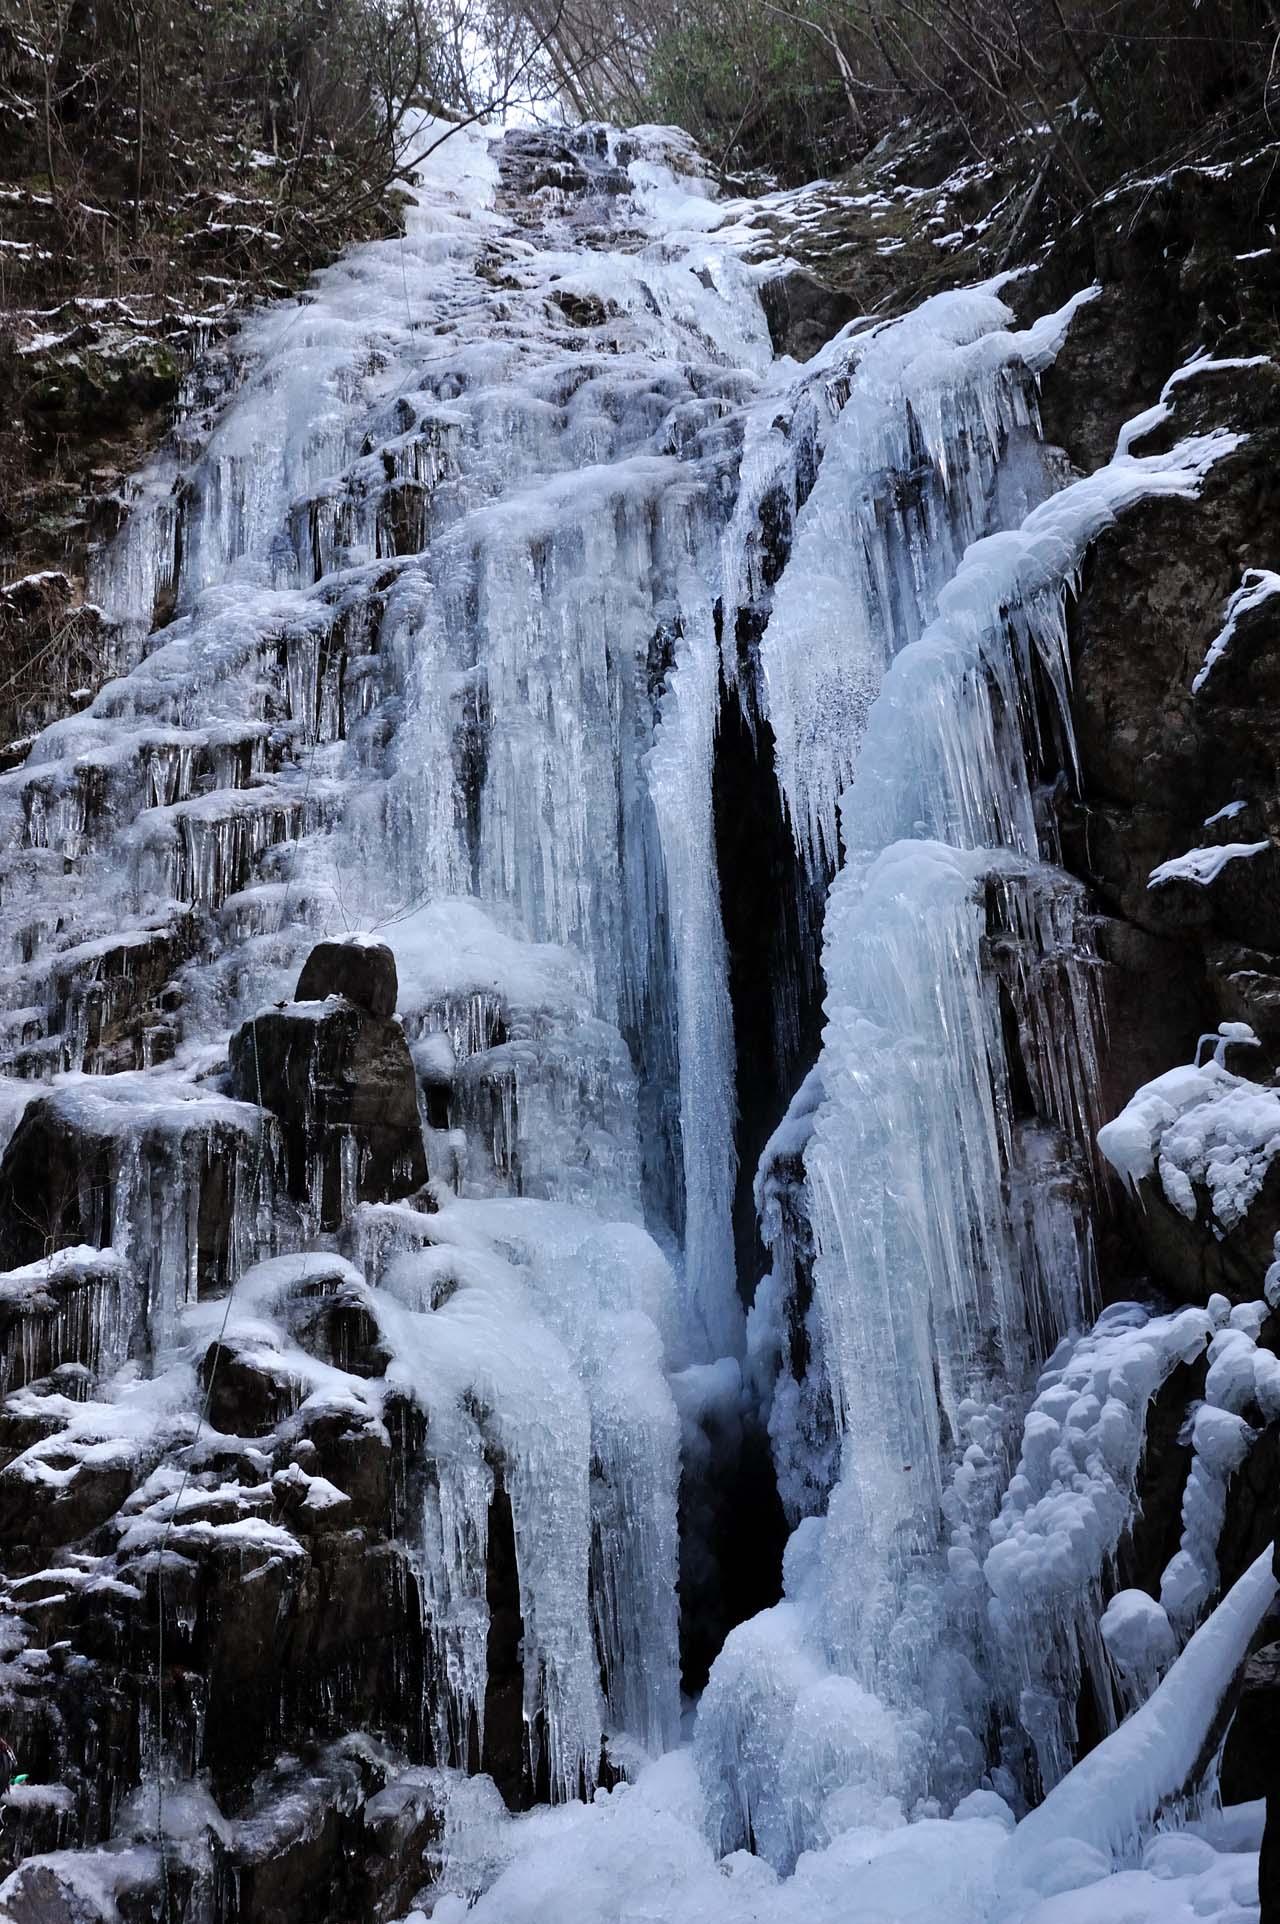 七曲滝の氷結_c0129047_23133796.jpg